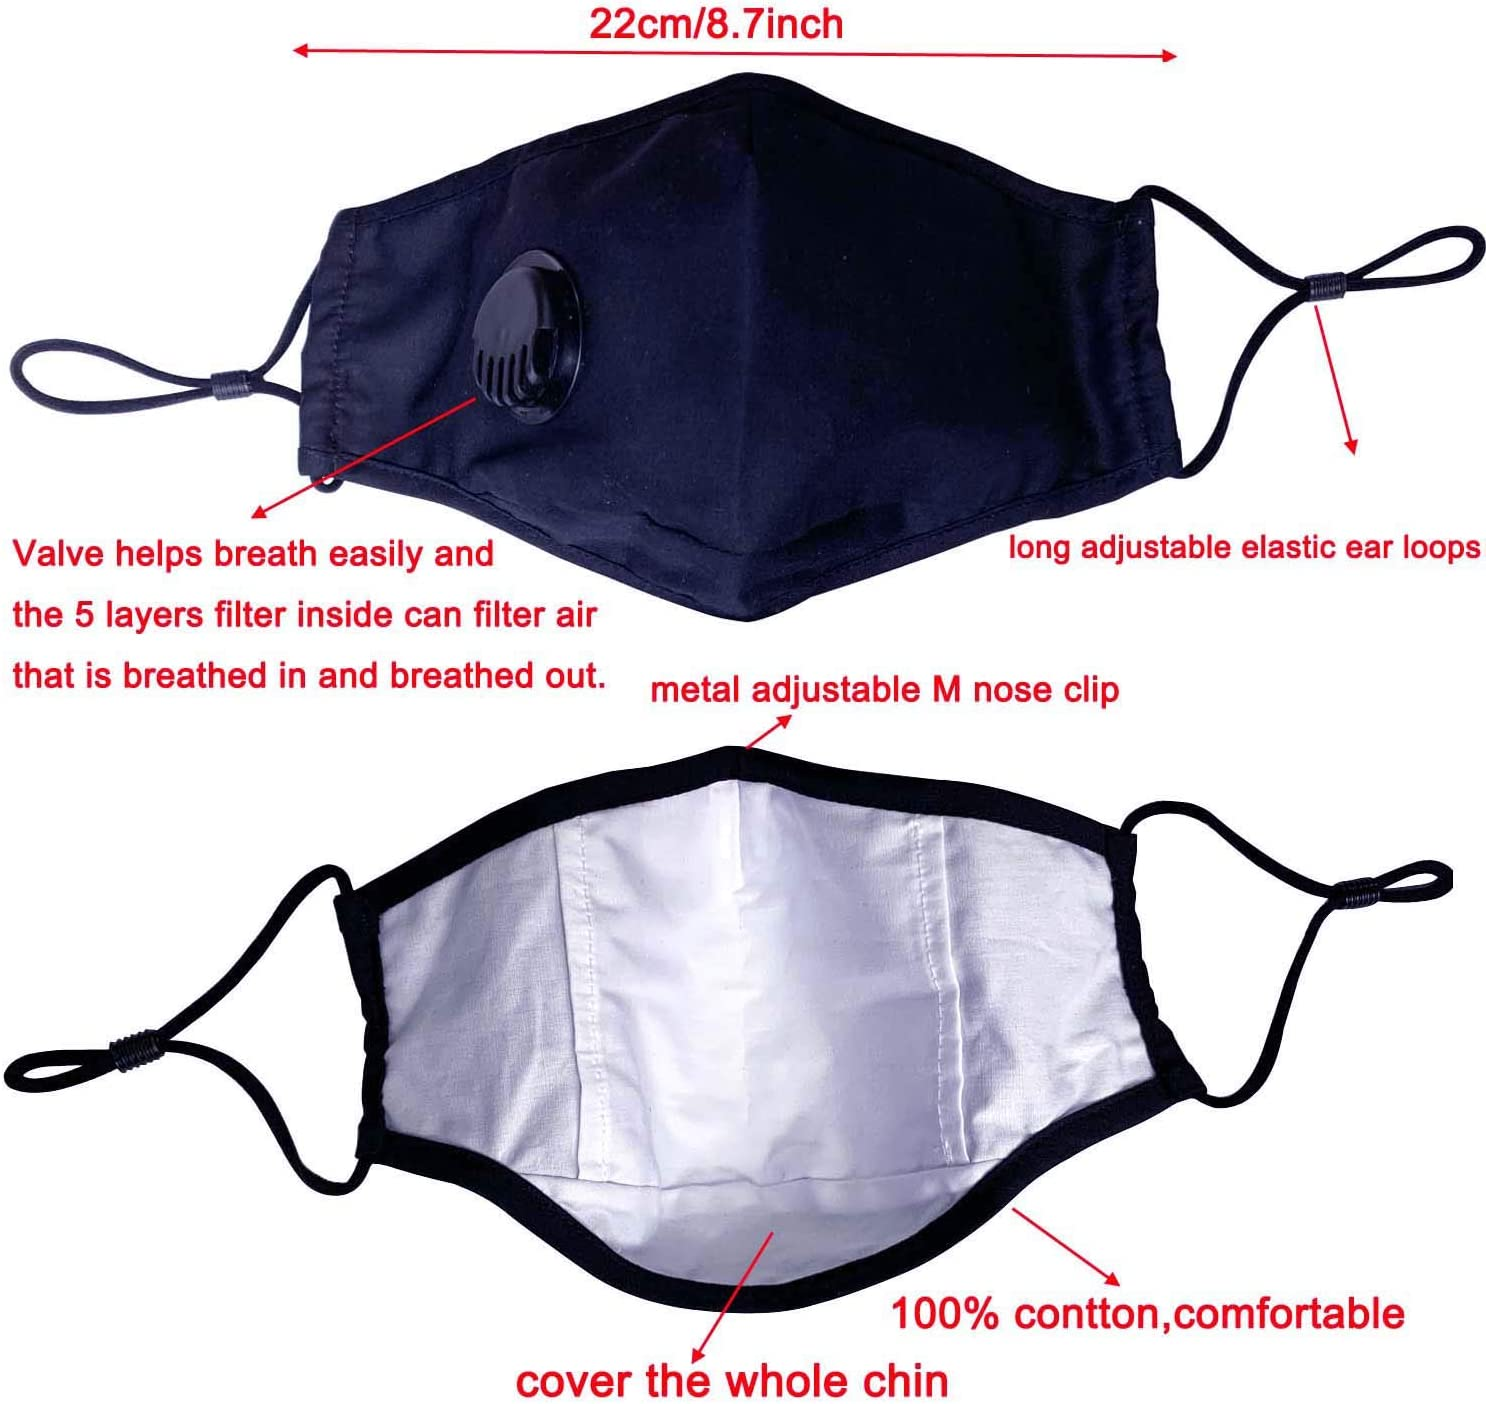 Face Coverings Reutilizables Lavables con 2 Piezas Filtro protecci/ón Total con Gancho Ajustable